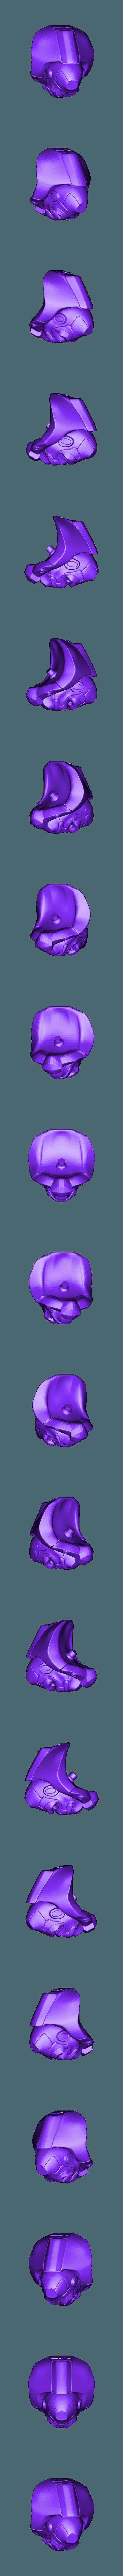 gorilla_tron_head.stl Download free STL file G - TRON • 3D printable model, TheTNR